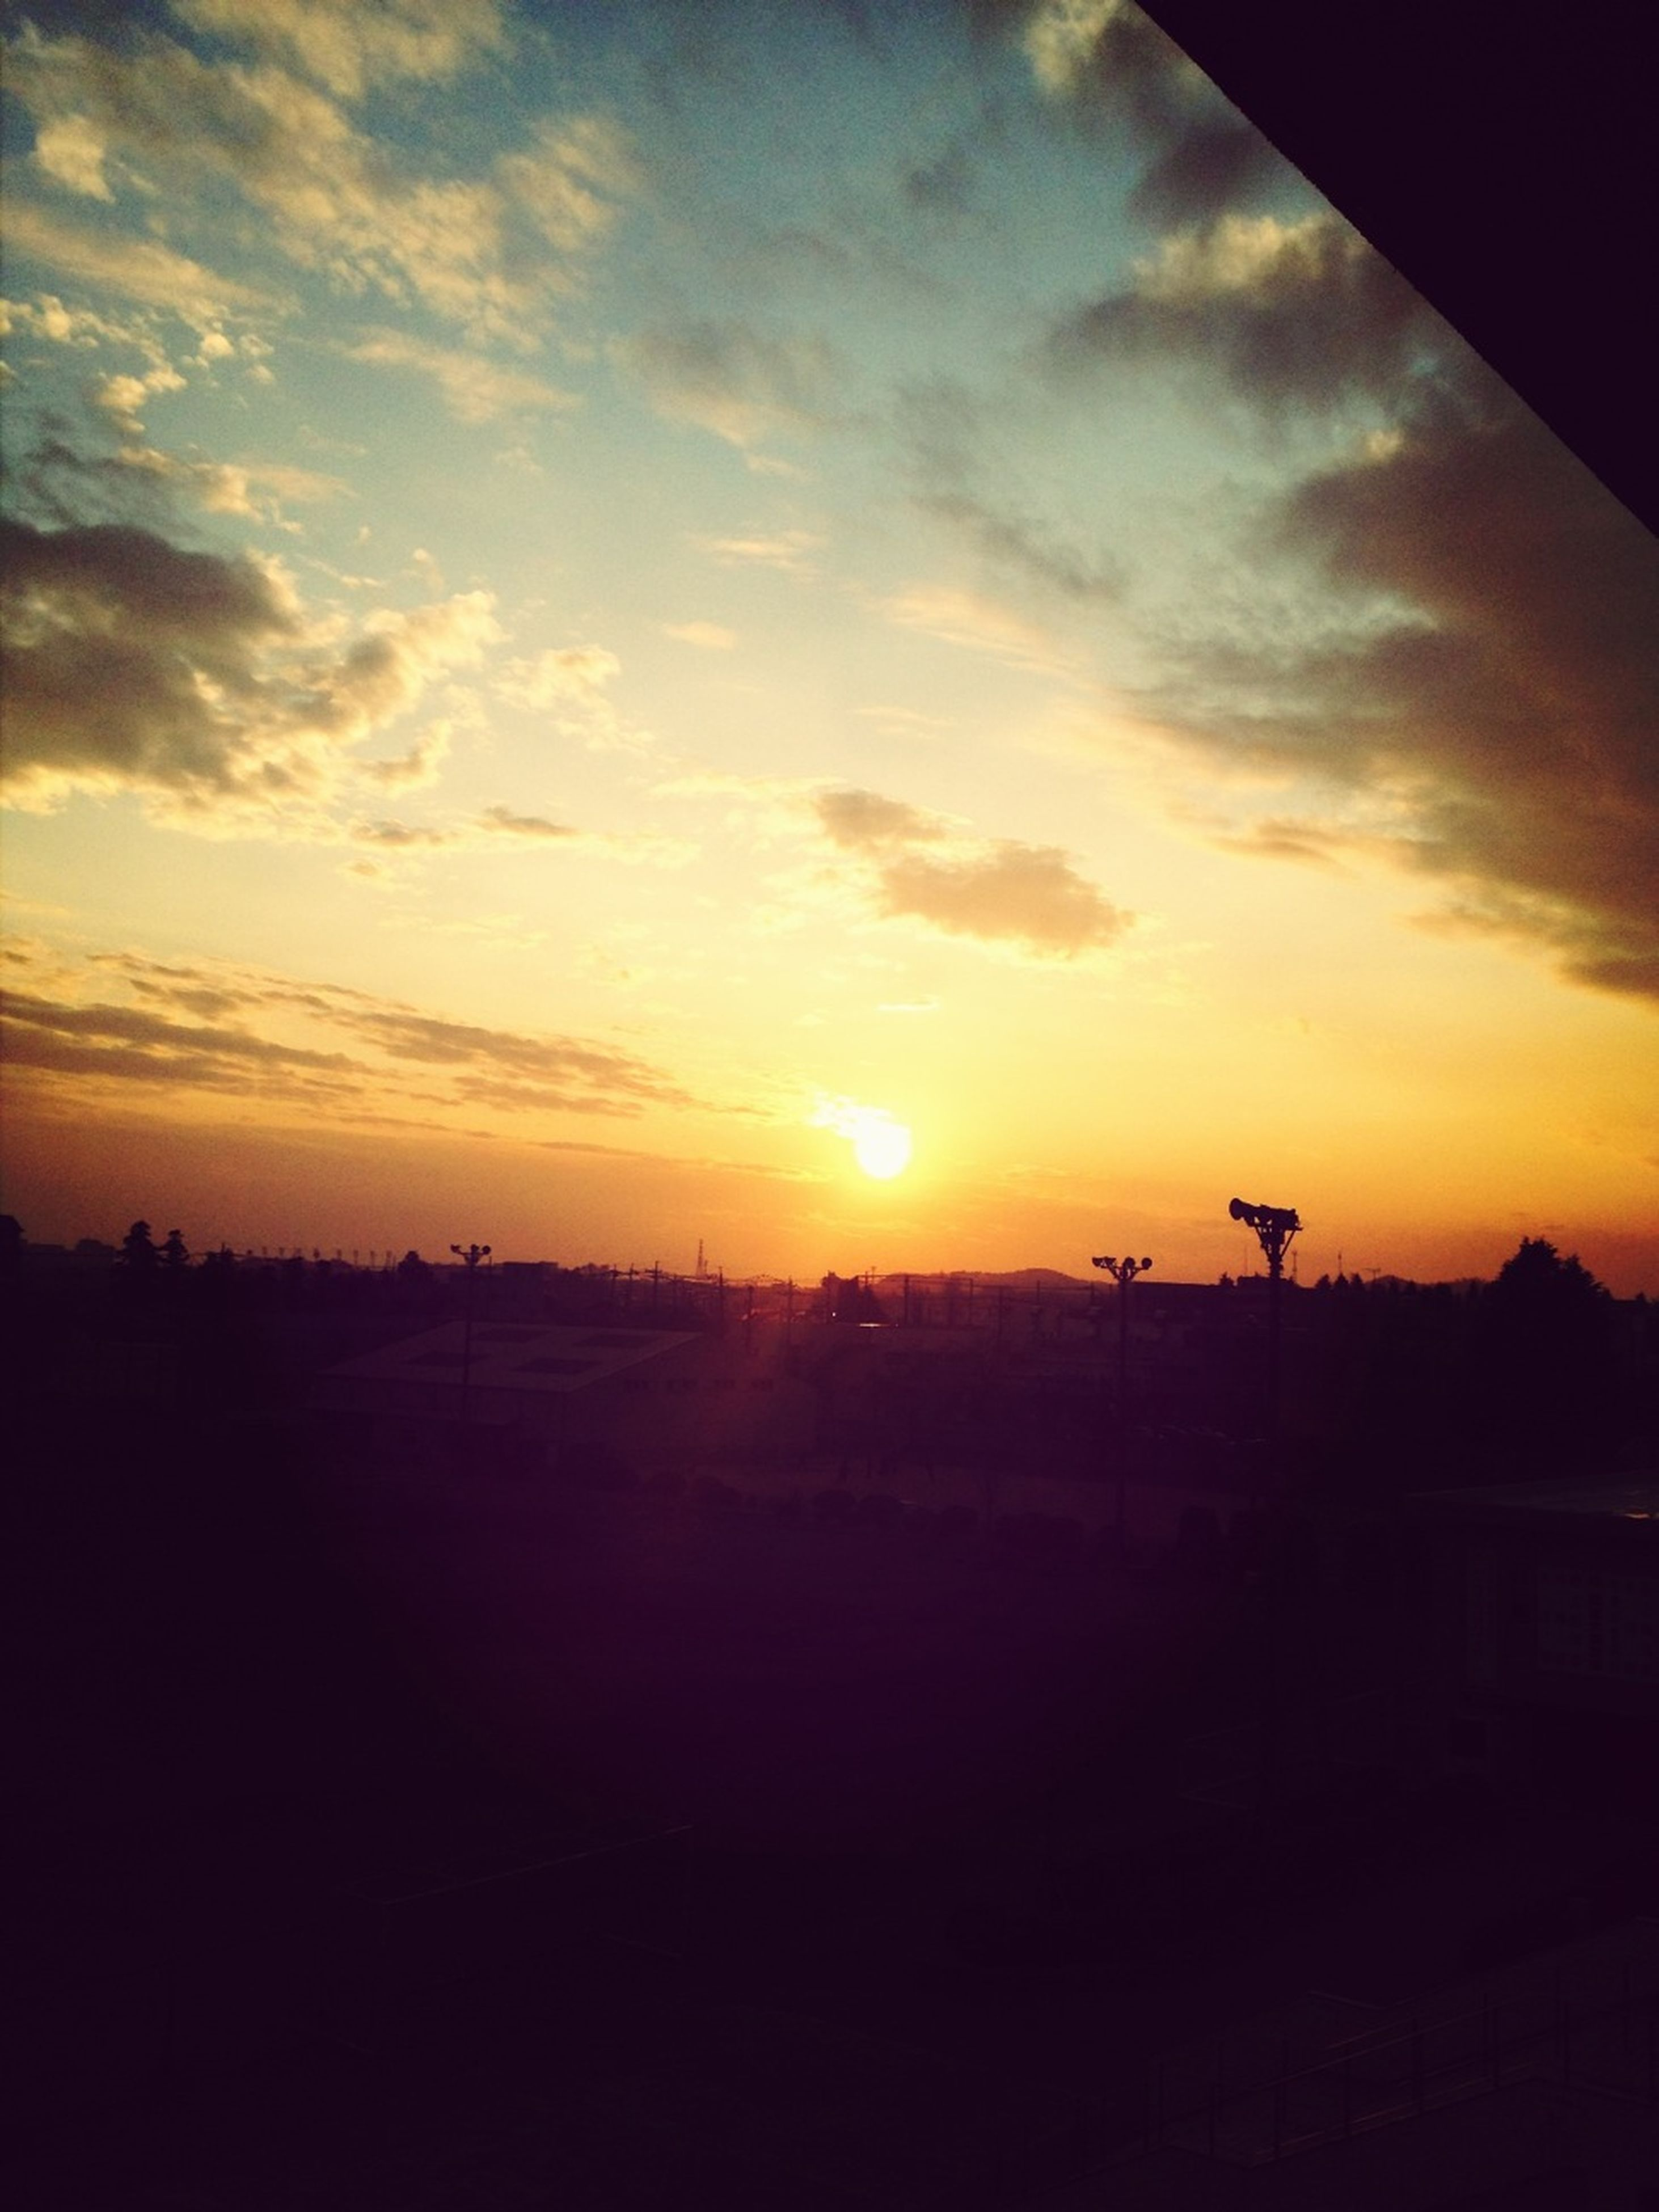 sunset, silhouette, sky, orange color, landscape, scenics, cloud - sky, beauty in nature, tranquil scene, tranquility, nature, sun, cloud, idyllic, field, sunlight, dark, dramatic sky, outdoors, no people